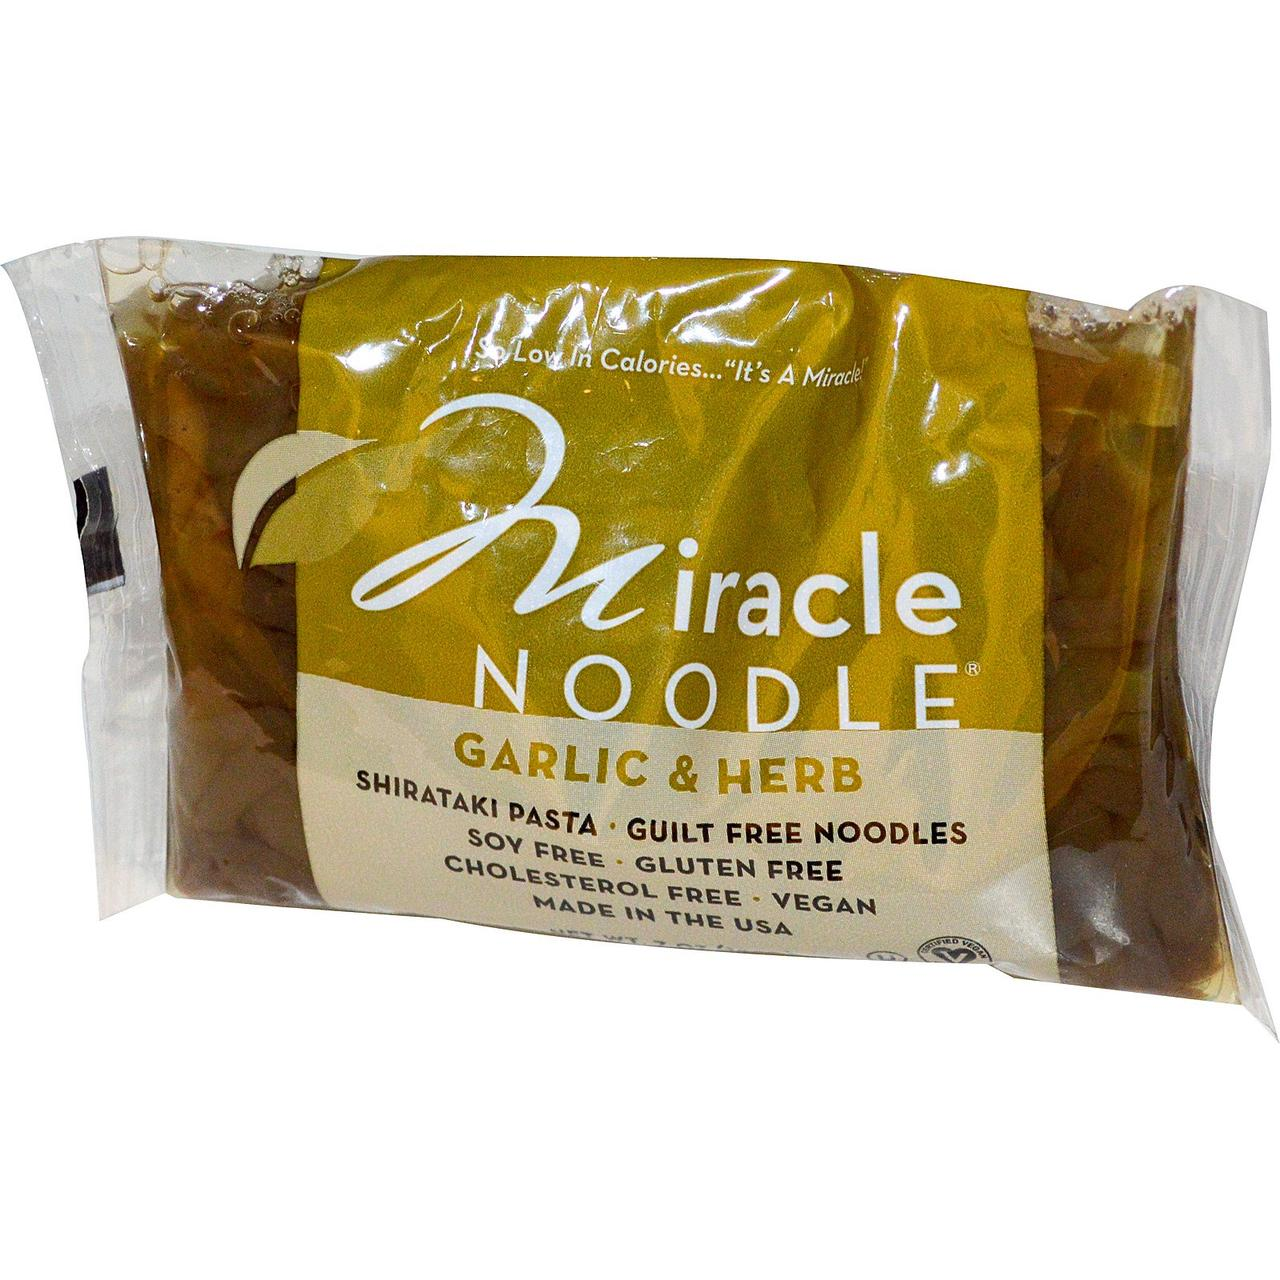 Miracle Noodle, Часник і трави, паста Ширатаки, 7 унцій (198 м)